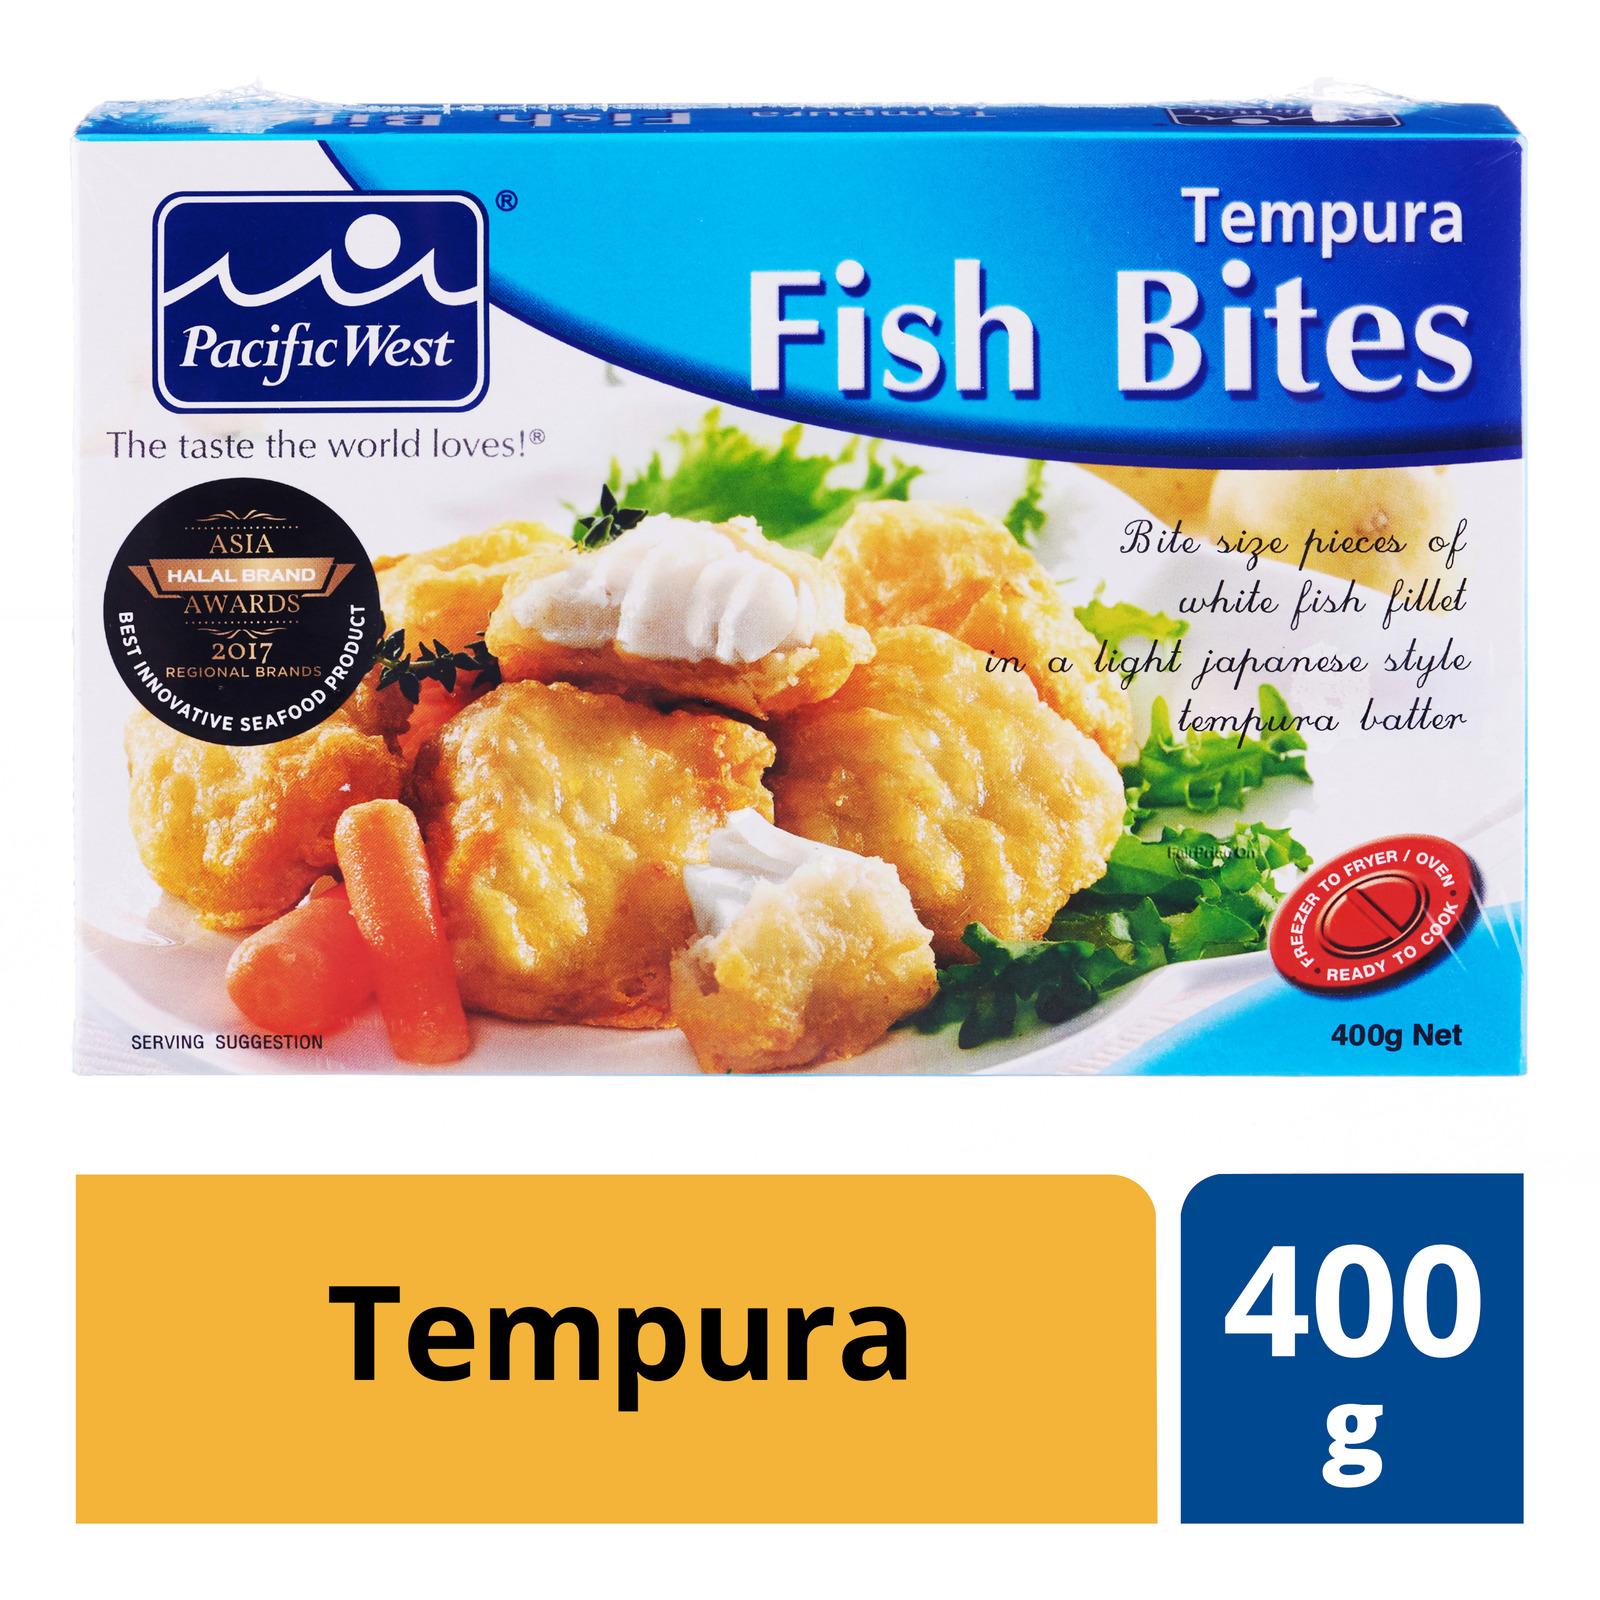 Pacific West Frozen Fish Bites Tempura